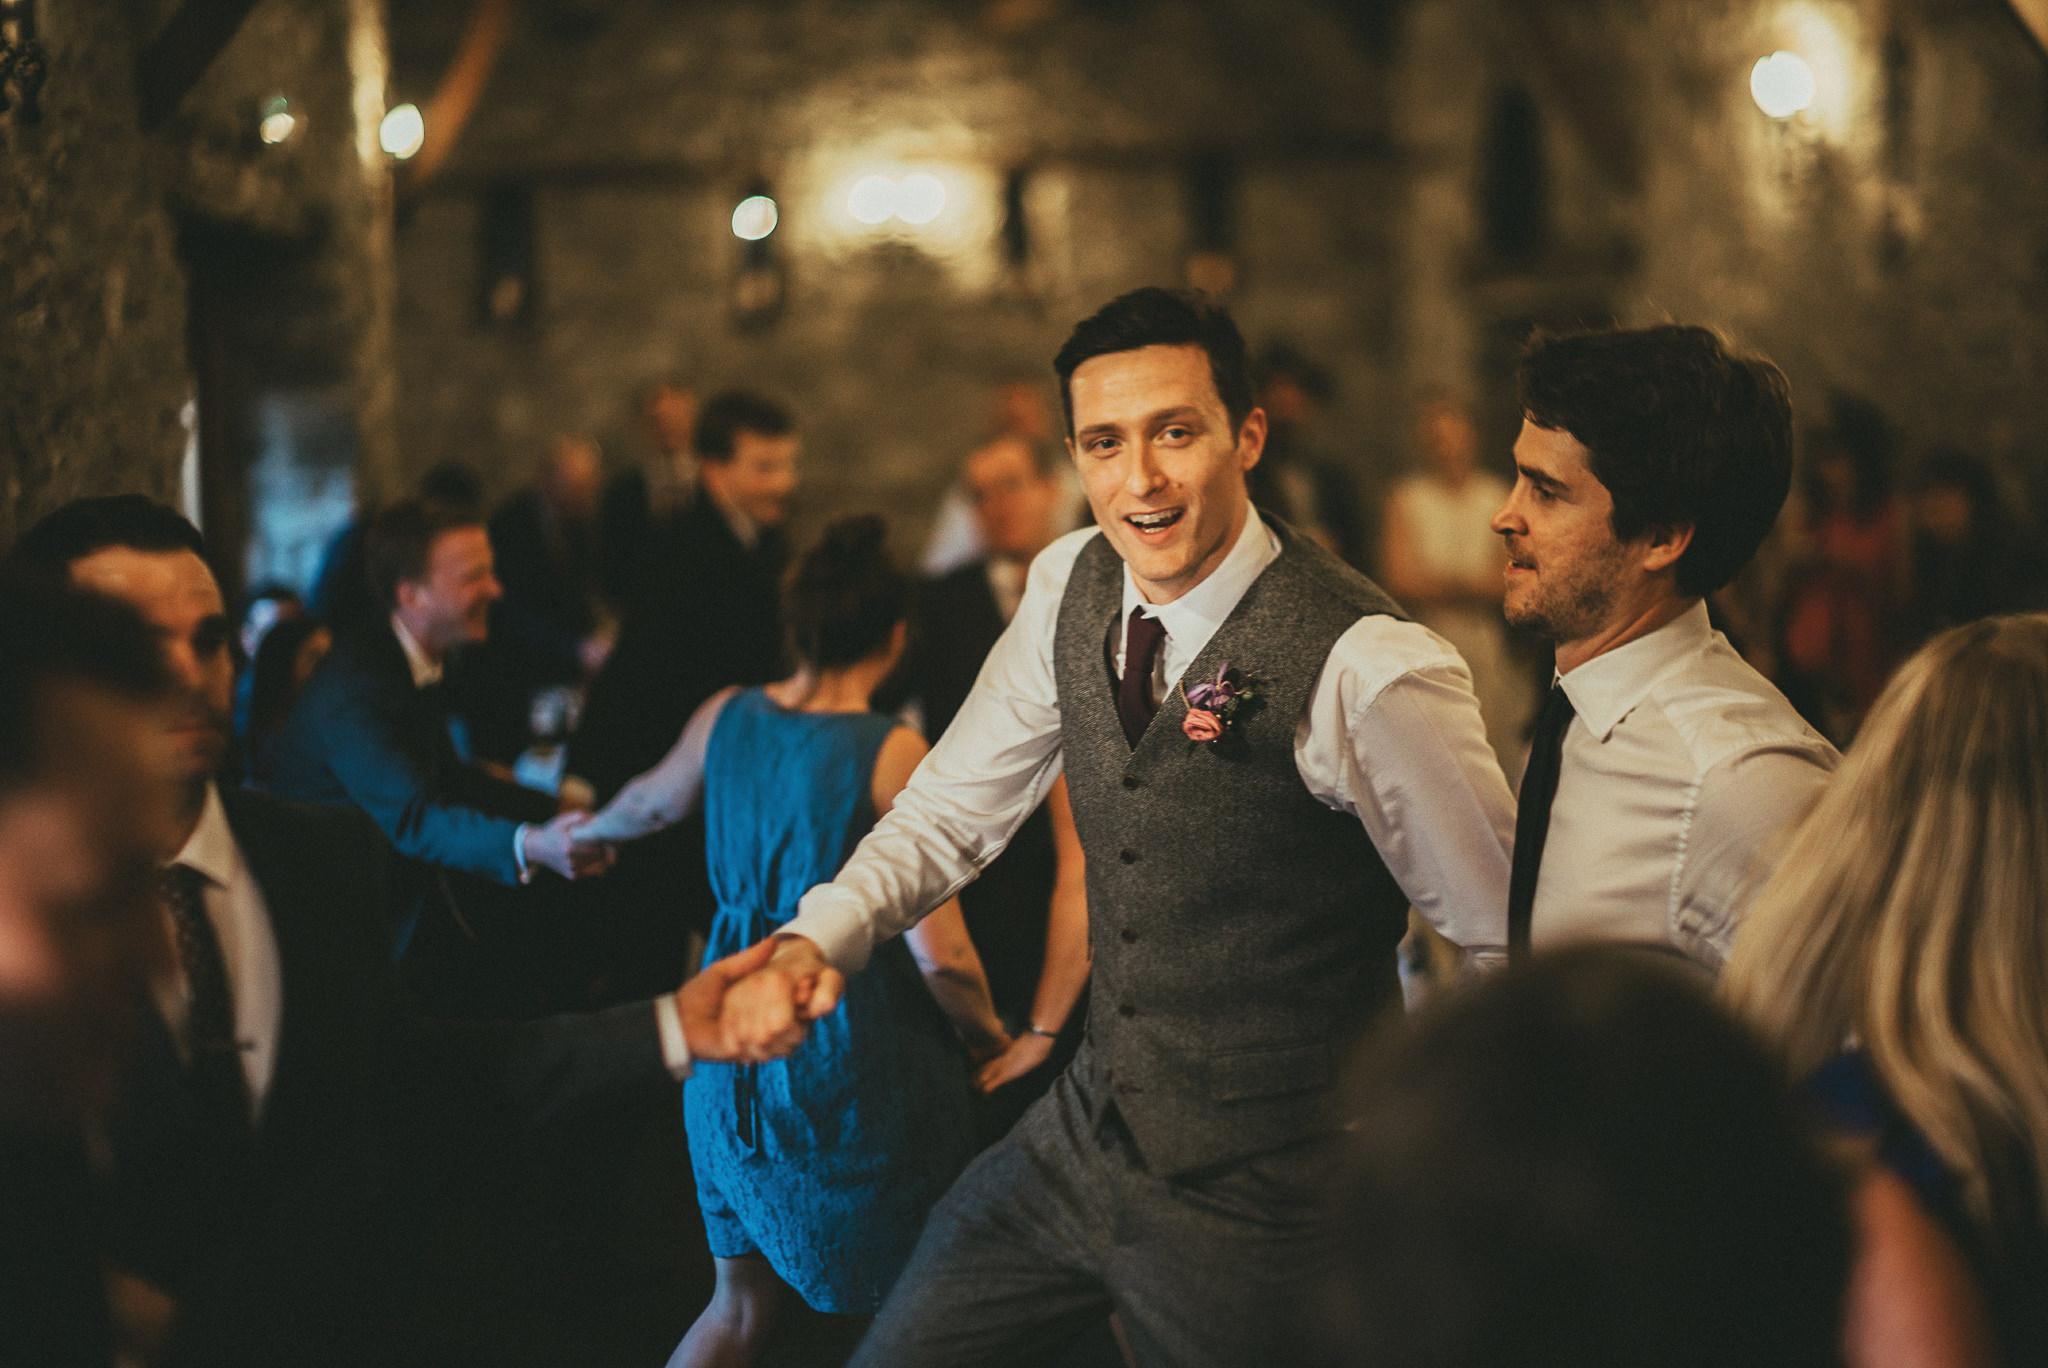 plas-isaf-corwen-north wales wedding-photography-photographer-91091